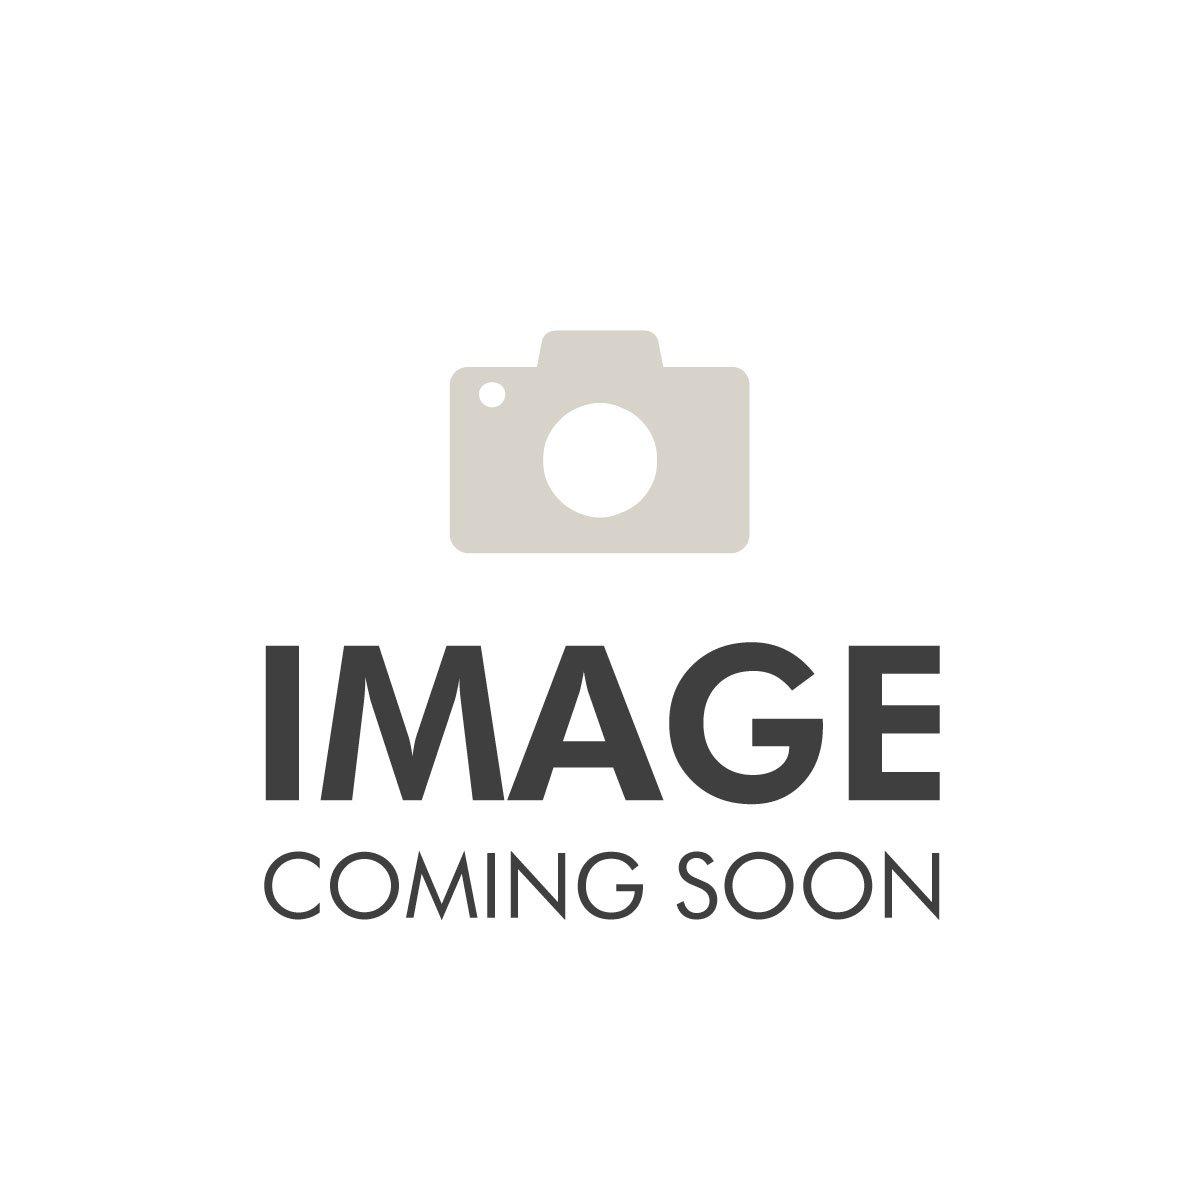 Uhlmann - Complete Foil Point - TiN